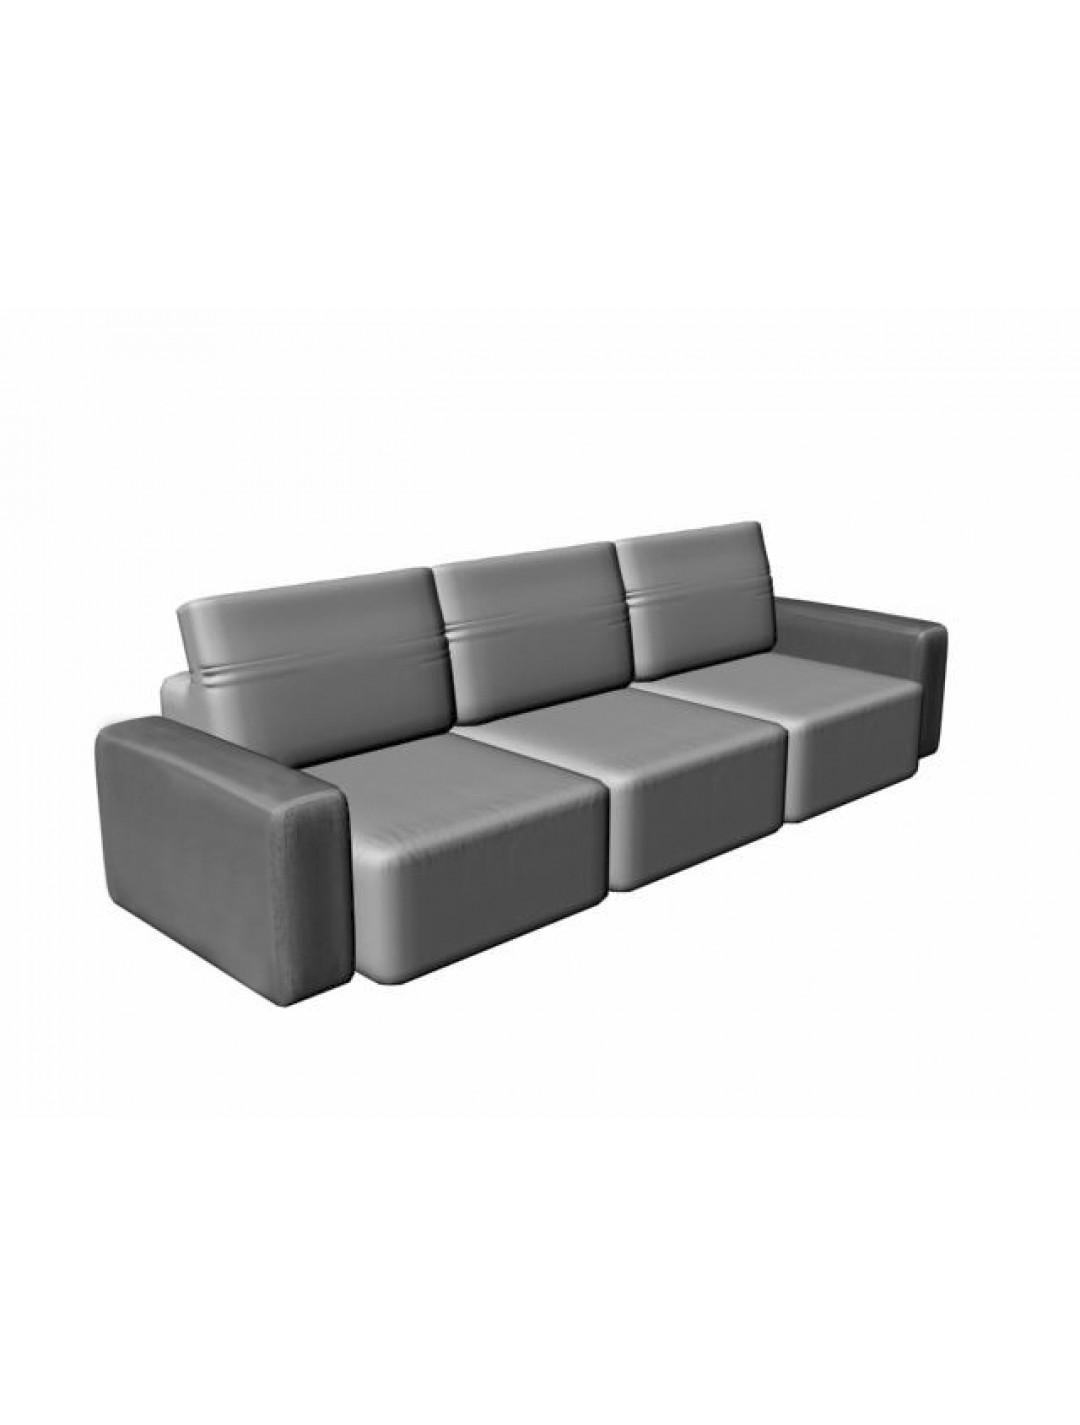 COSMOPOL 3 SEAT SOFA 2 ARMS, C.O.M.